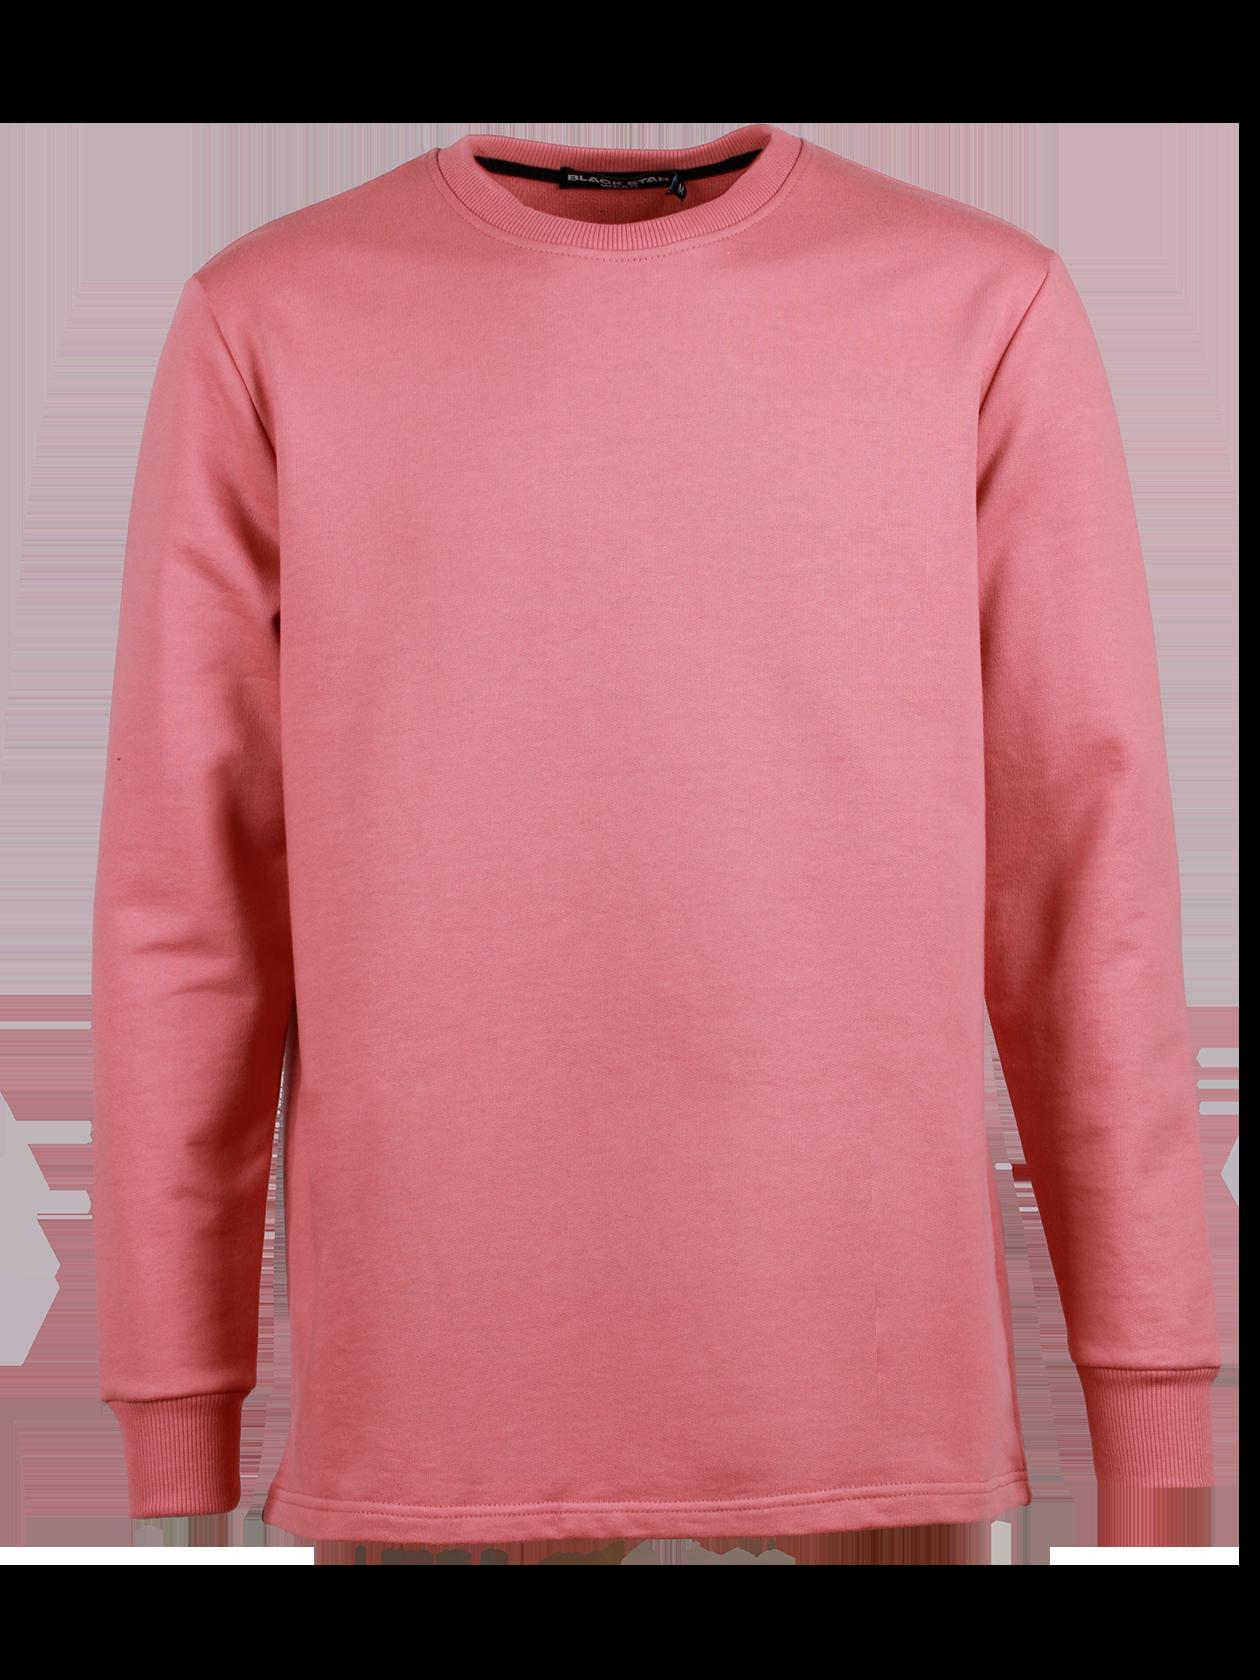 Unisex hoodie VINTAGE THIRTEEN<br><br>size: XS<br>color: Dark Rose<br>gender: male